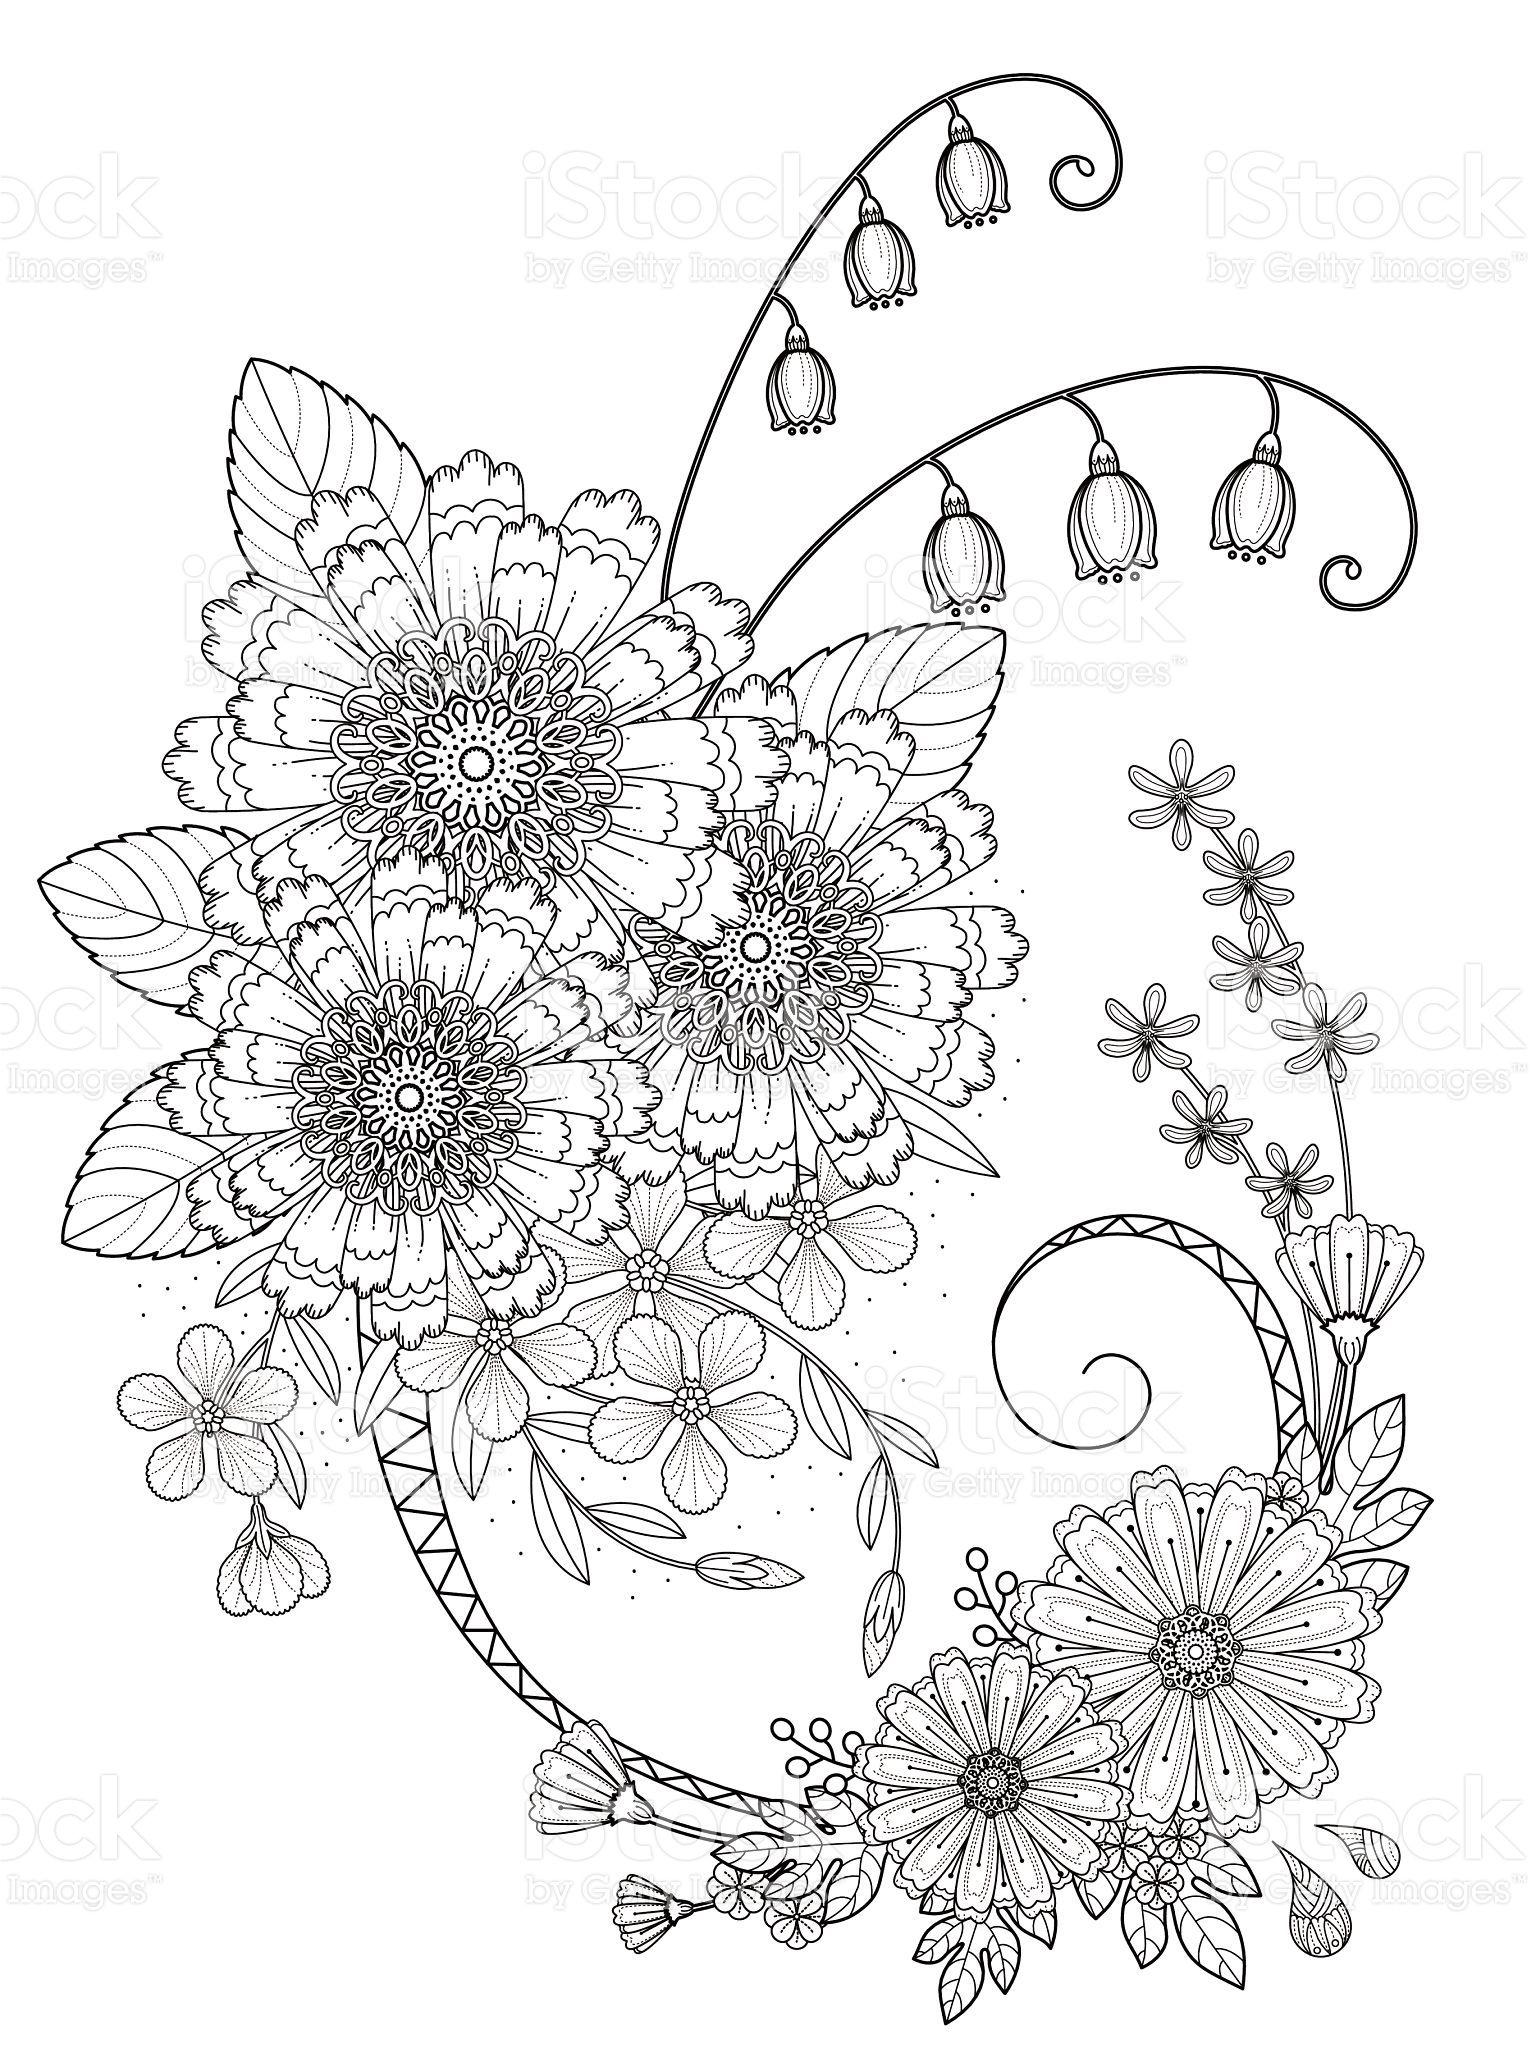 romantic floral coloring page in exquisite line | Flores y frutas 06 ...